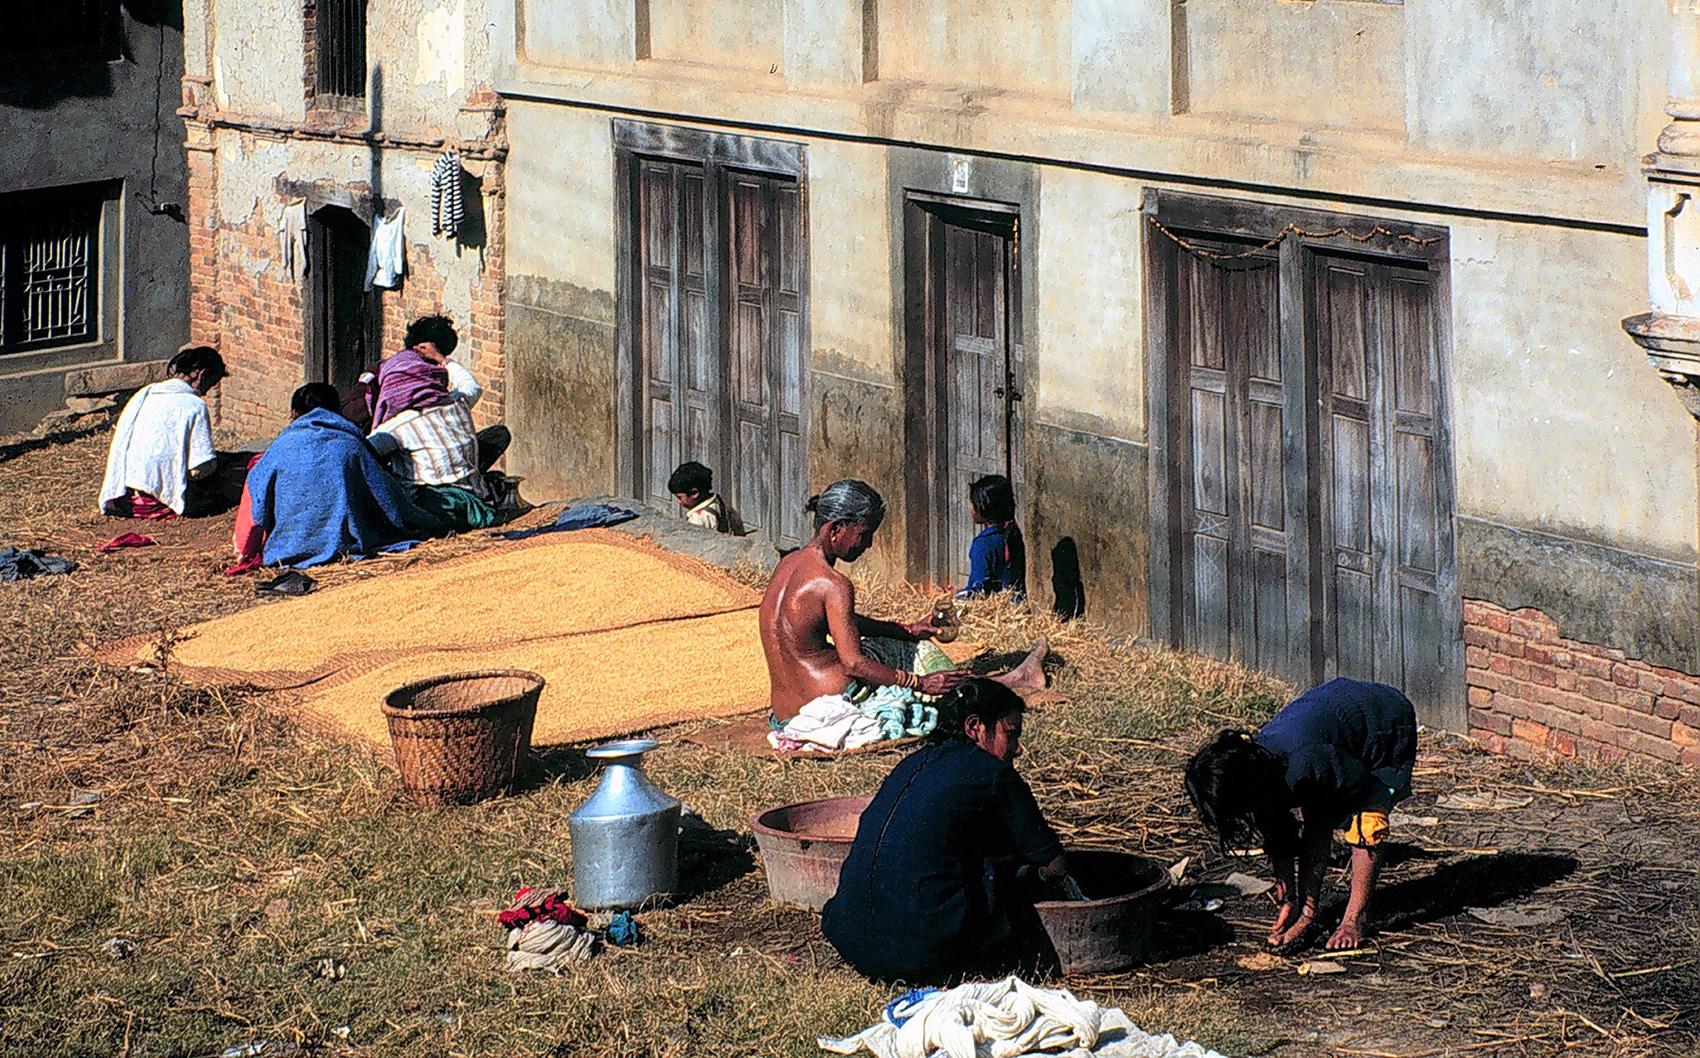 misure giuste Sonia Costa _ Afternoon in the village